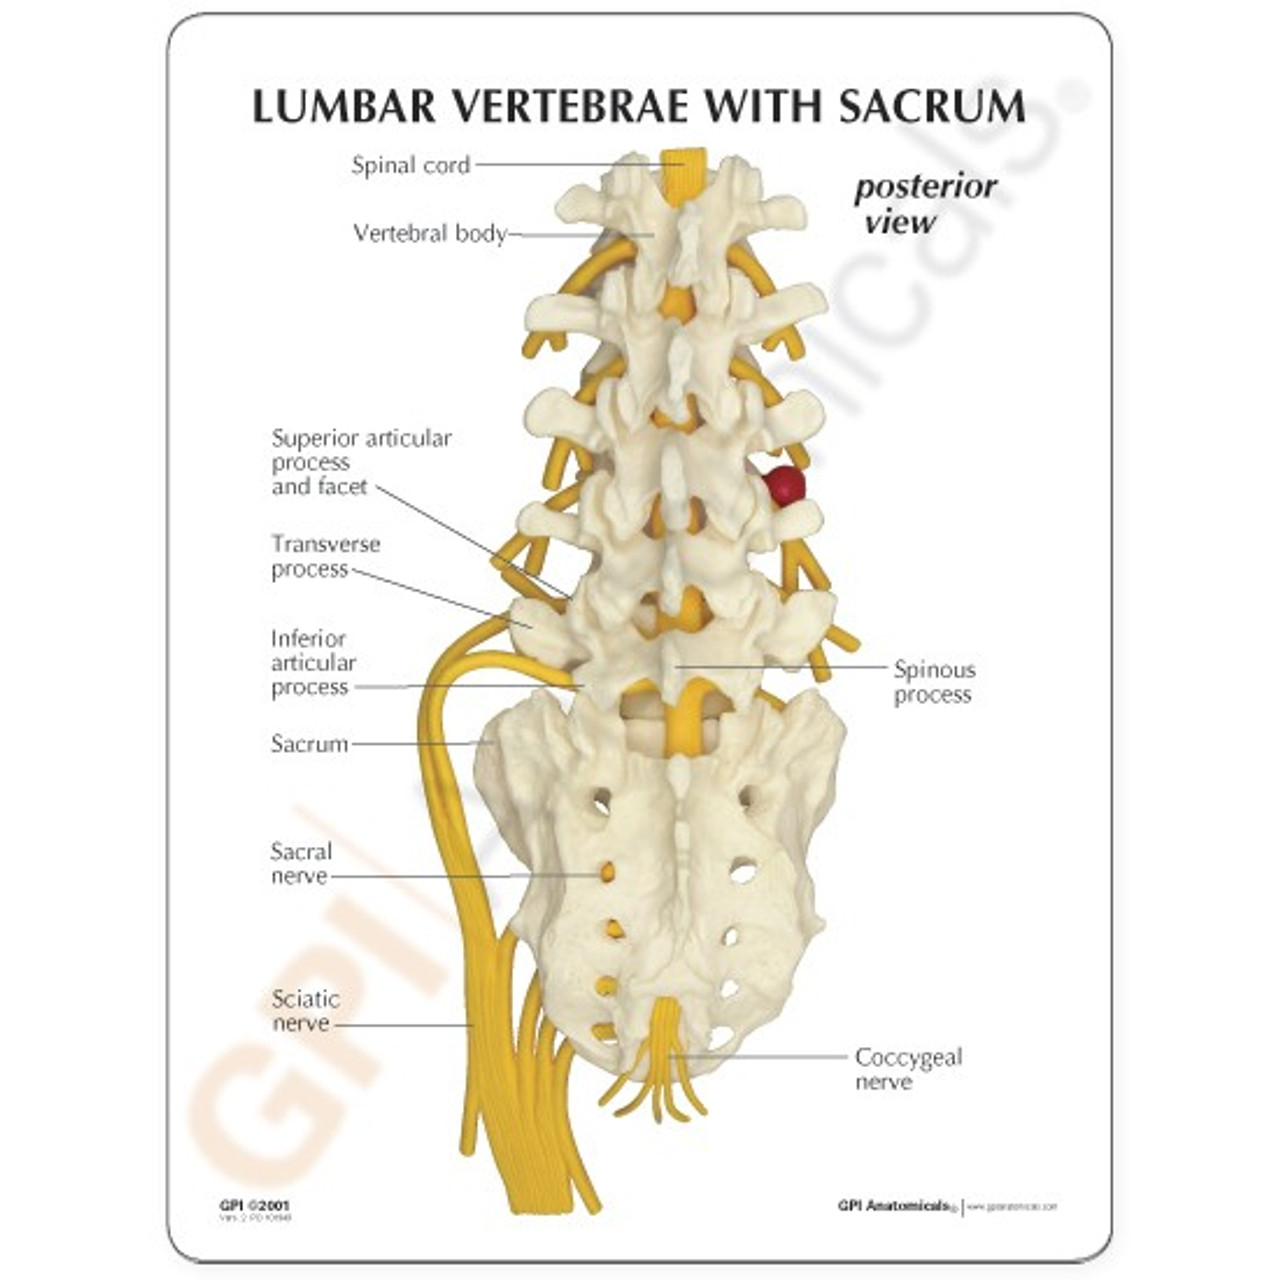 Lumbar Vertebrae and Sacrum  Description Card